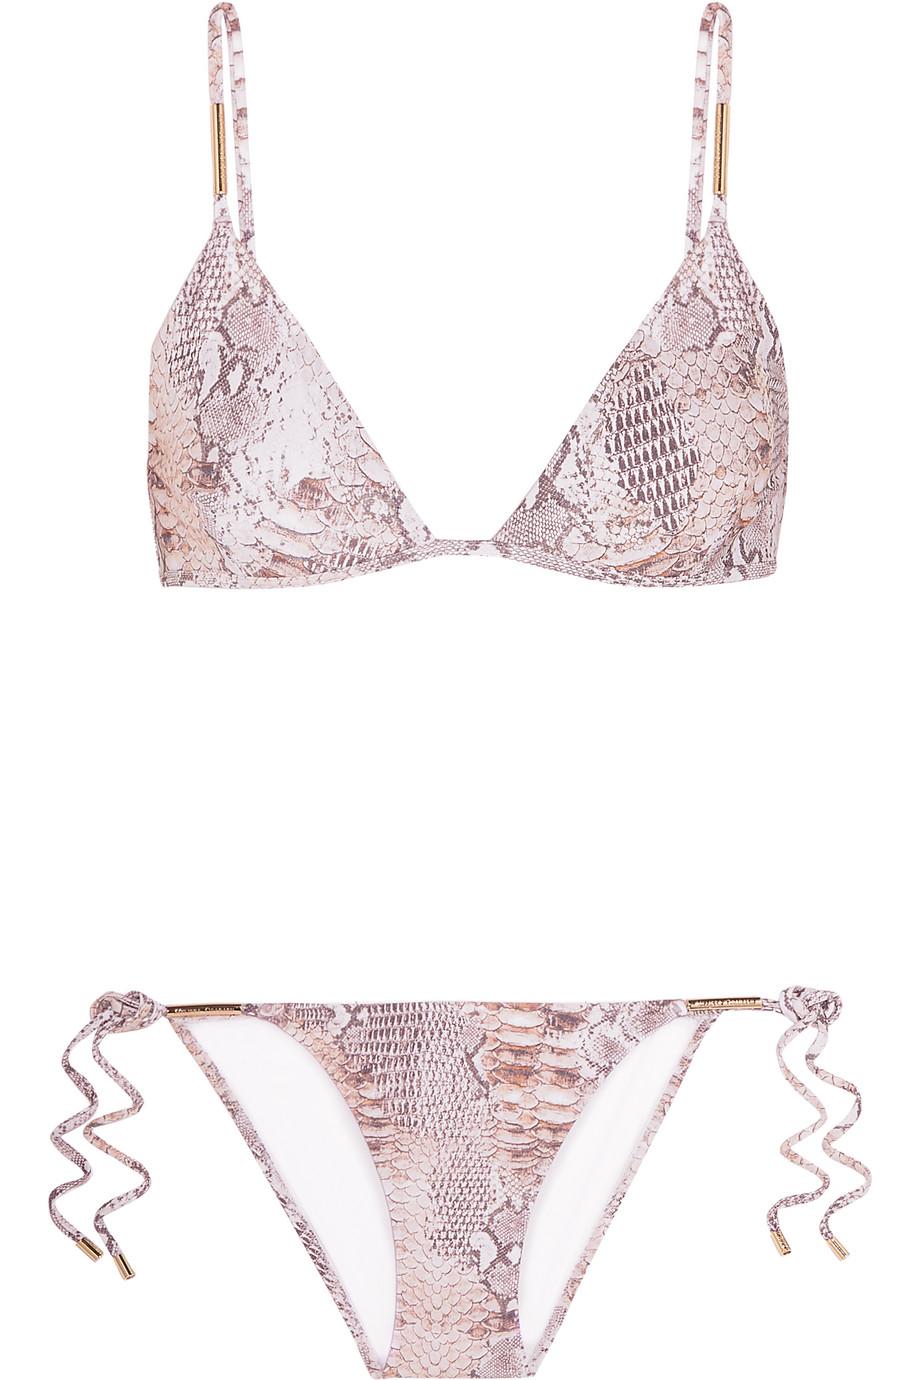 Melissa Odabash Verona Snake-Print Triangle Bikini, Ecru/Snake Print, Women's, Size: 6